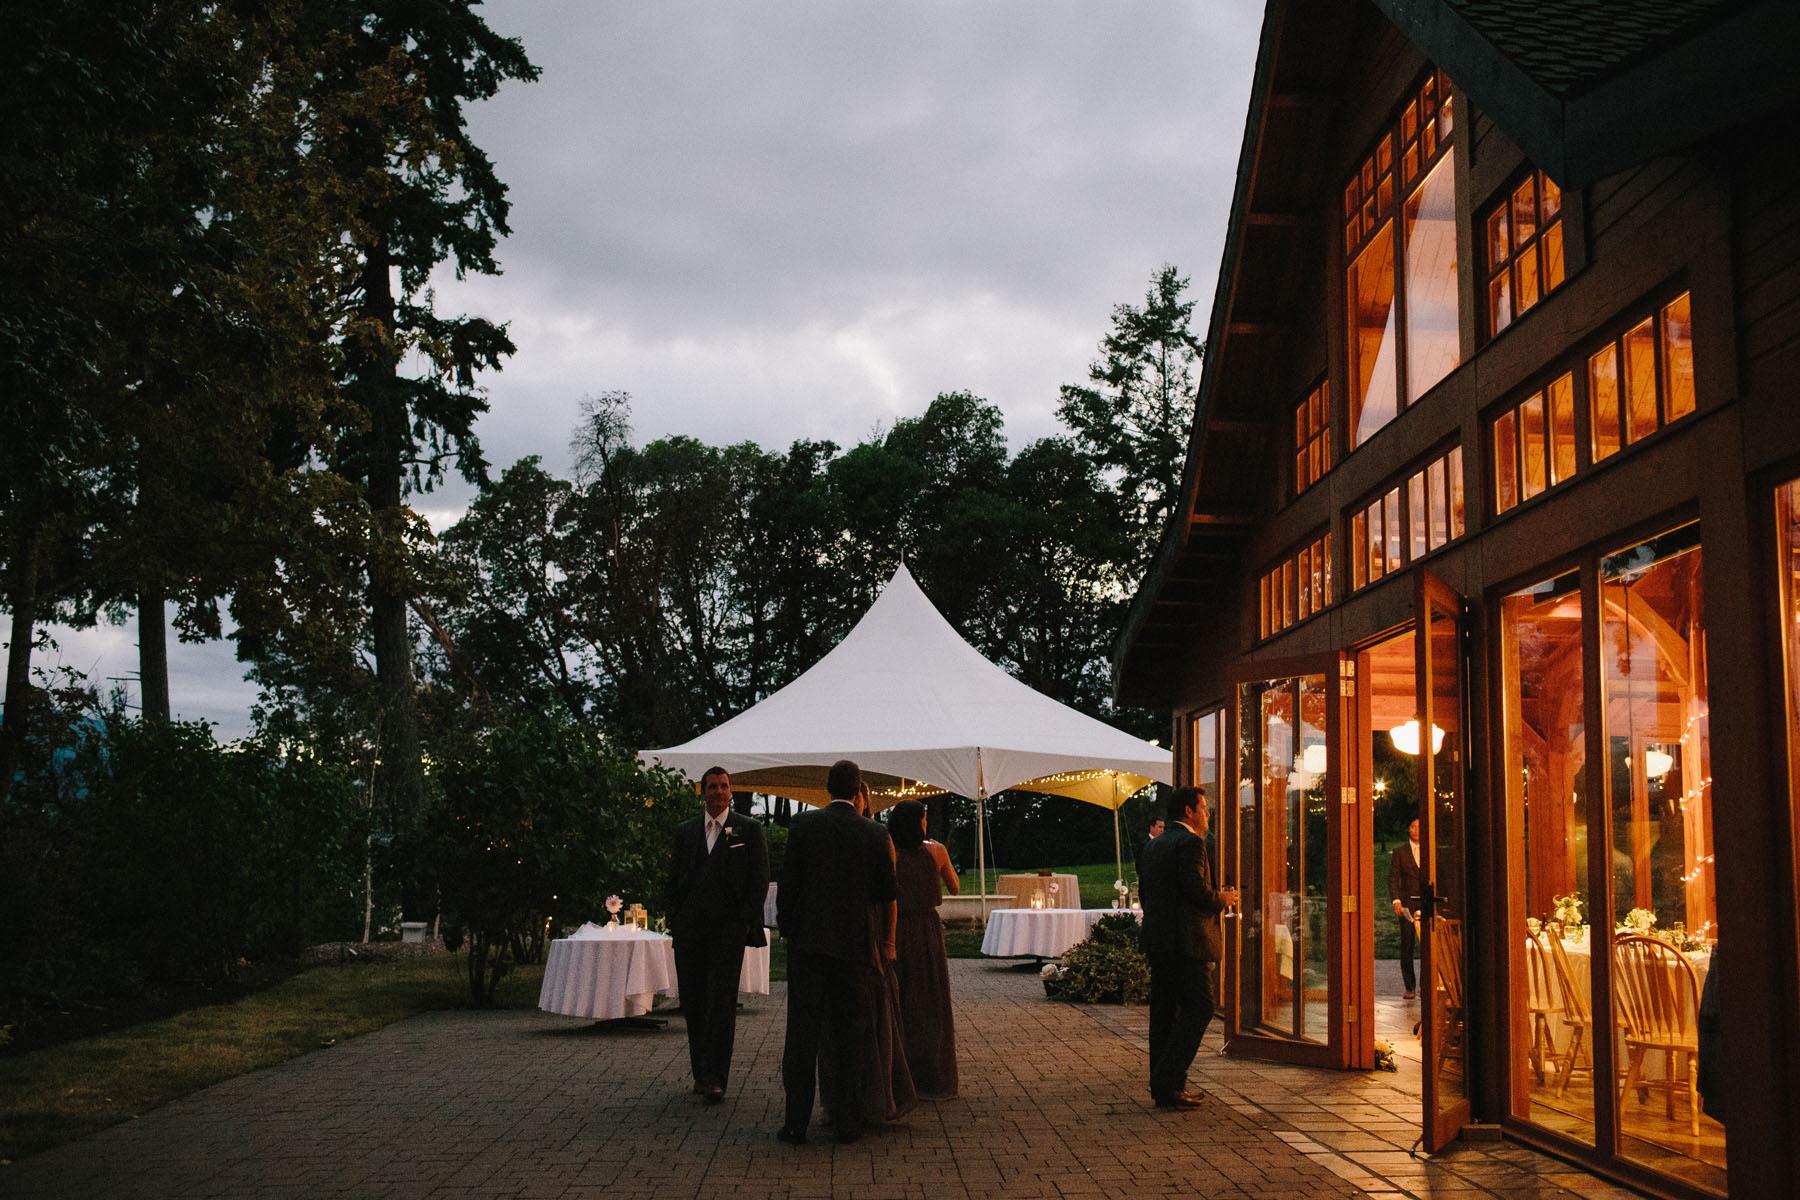 thetis-island-wedding-photographer-rp-rn-170.jpg